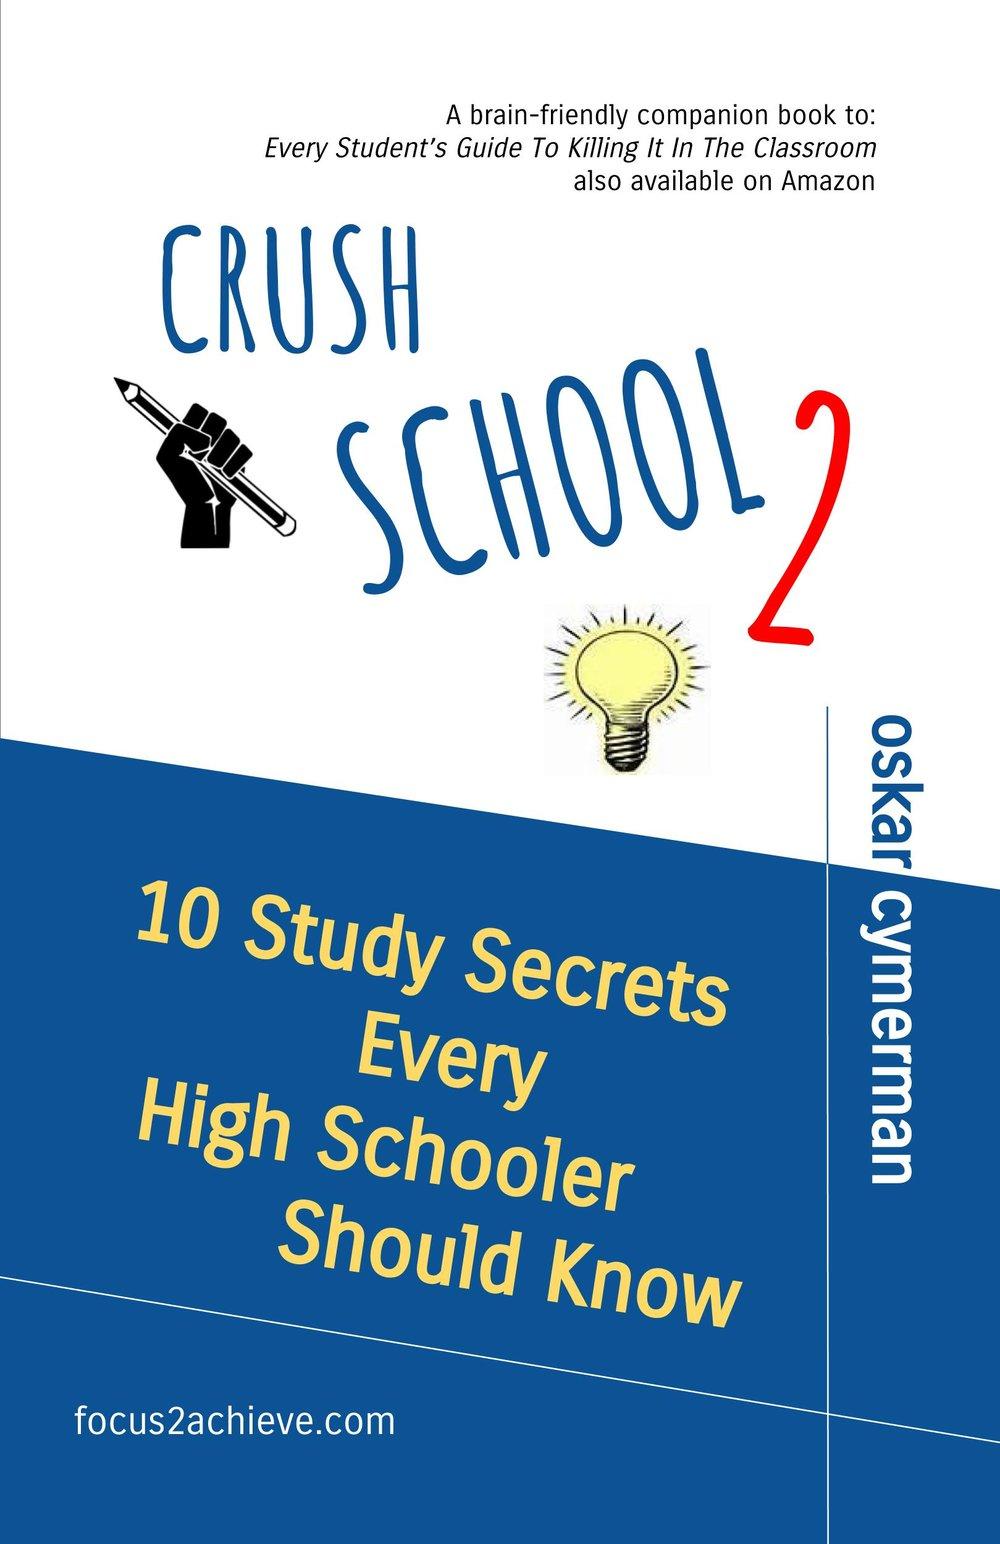 CRUSH SCHOOL 2 FREE EBOOK.jpg